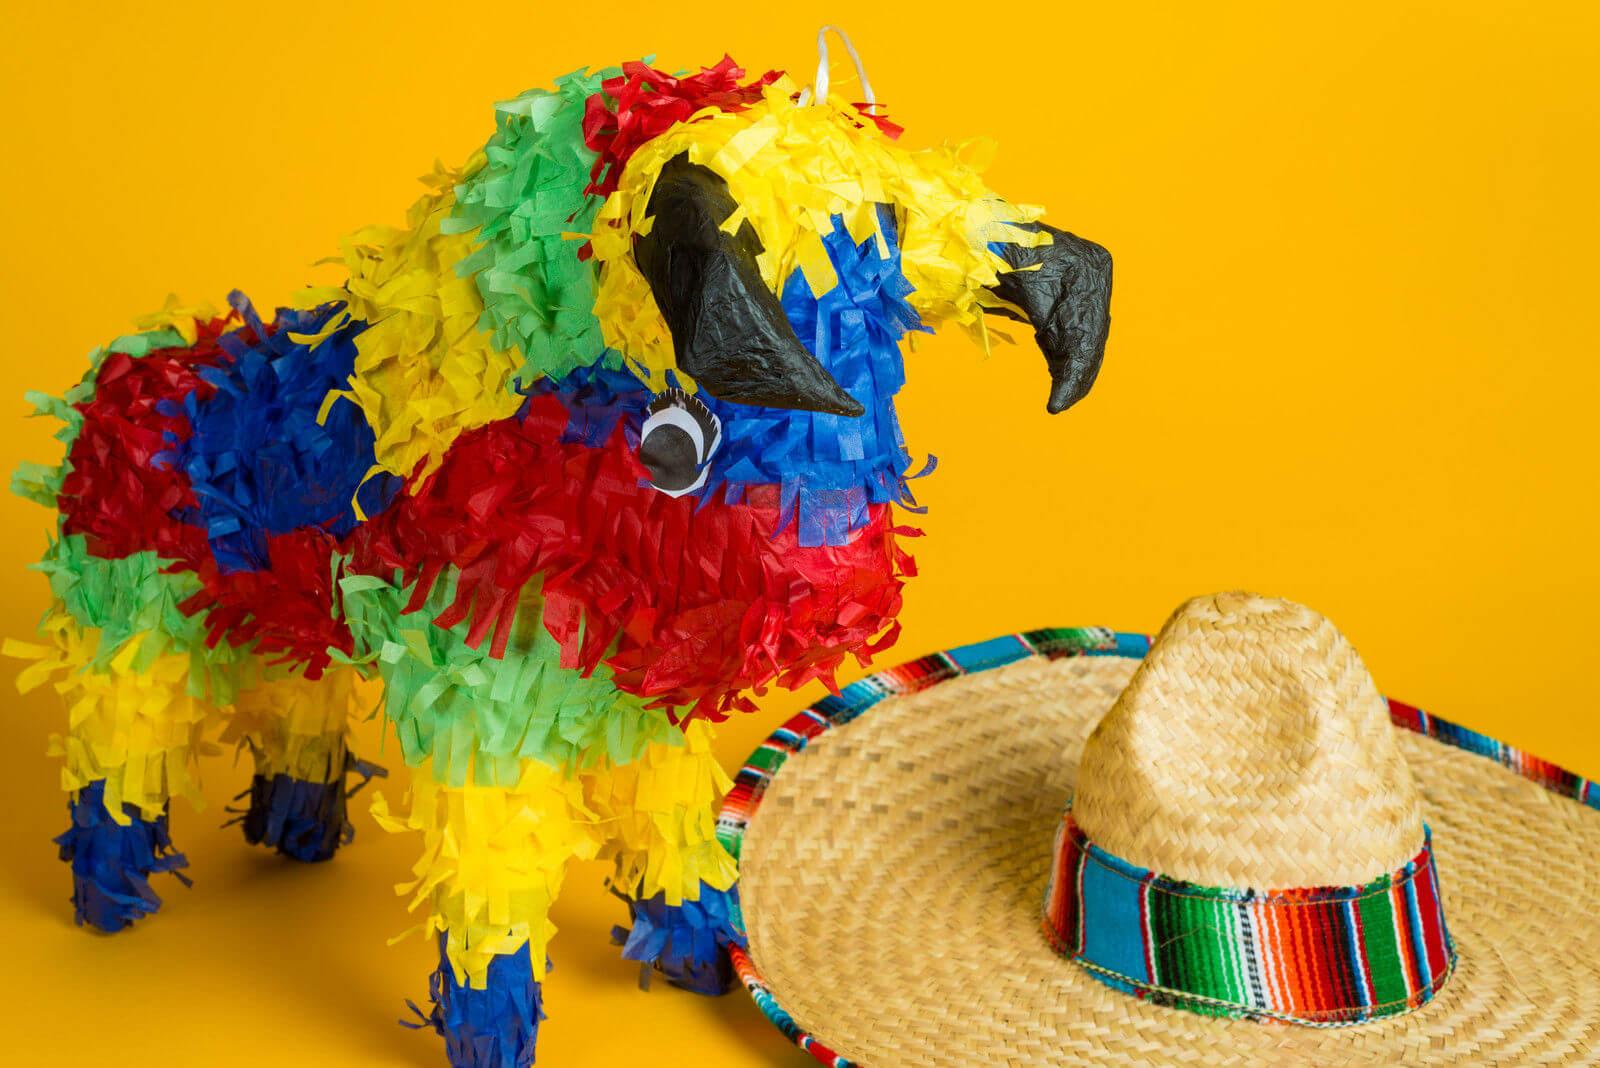 Paper-mache hand-made bull pinata and a mexican sombrero.